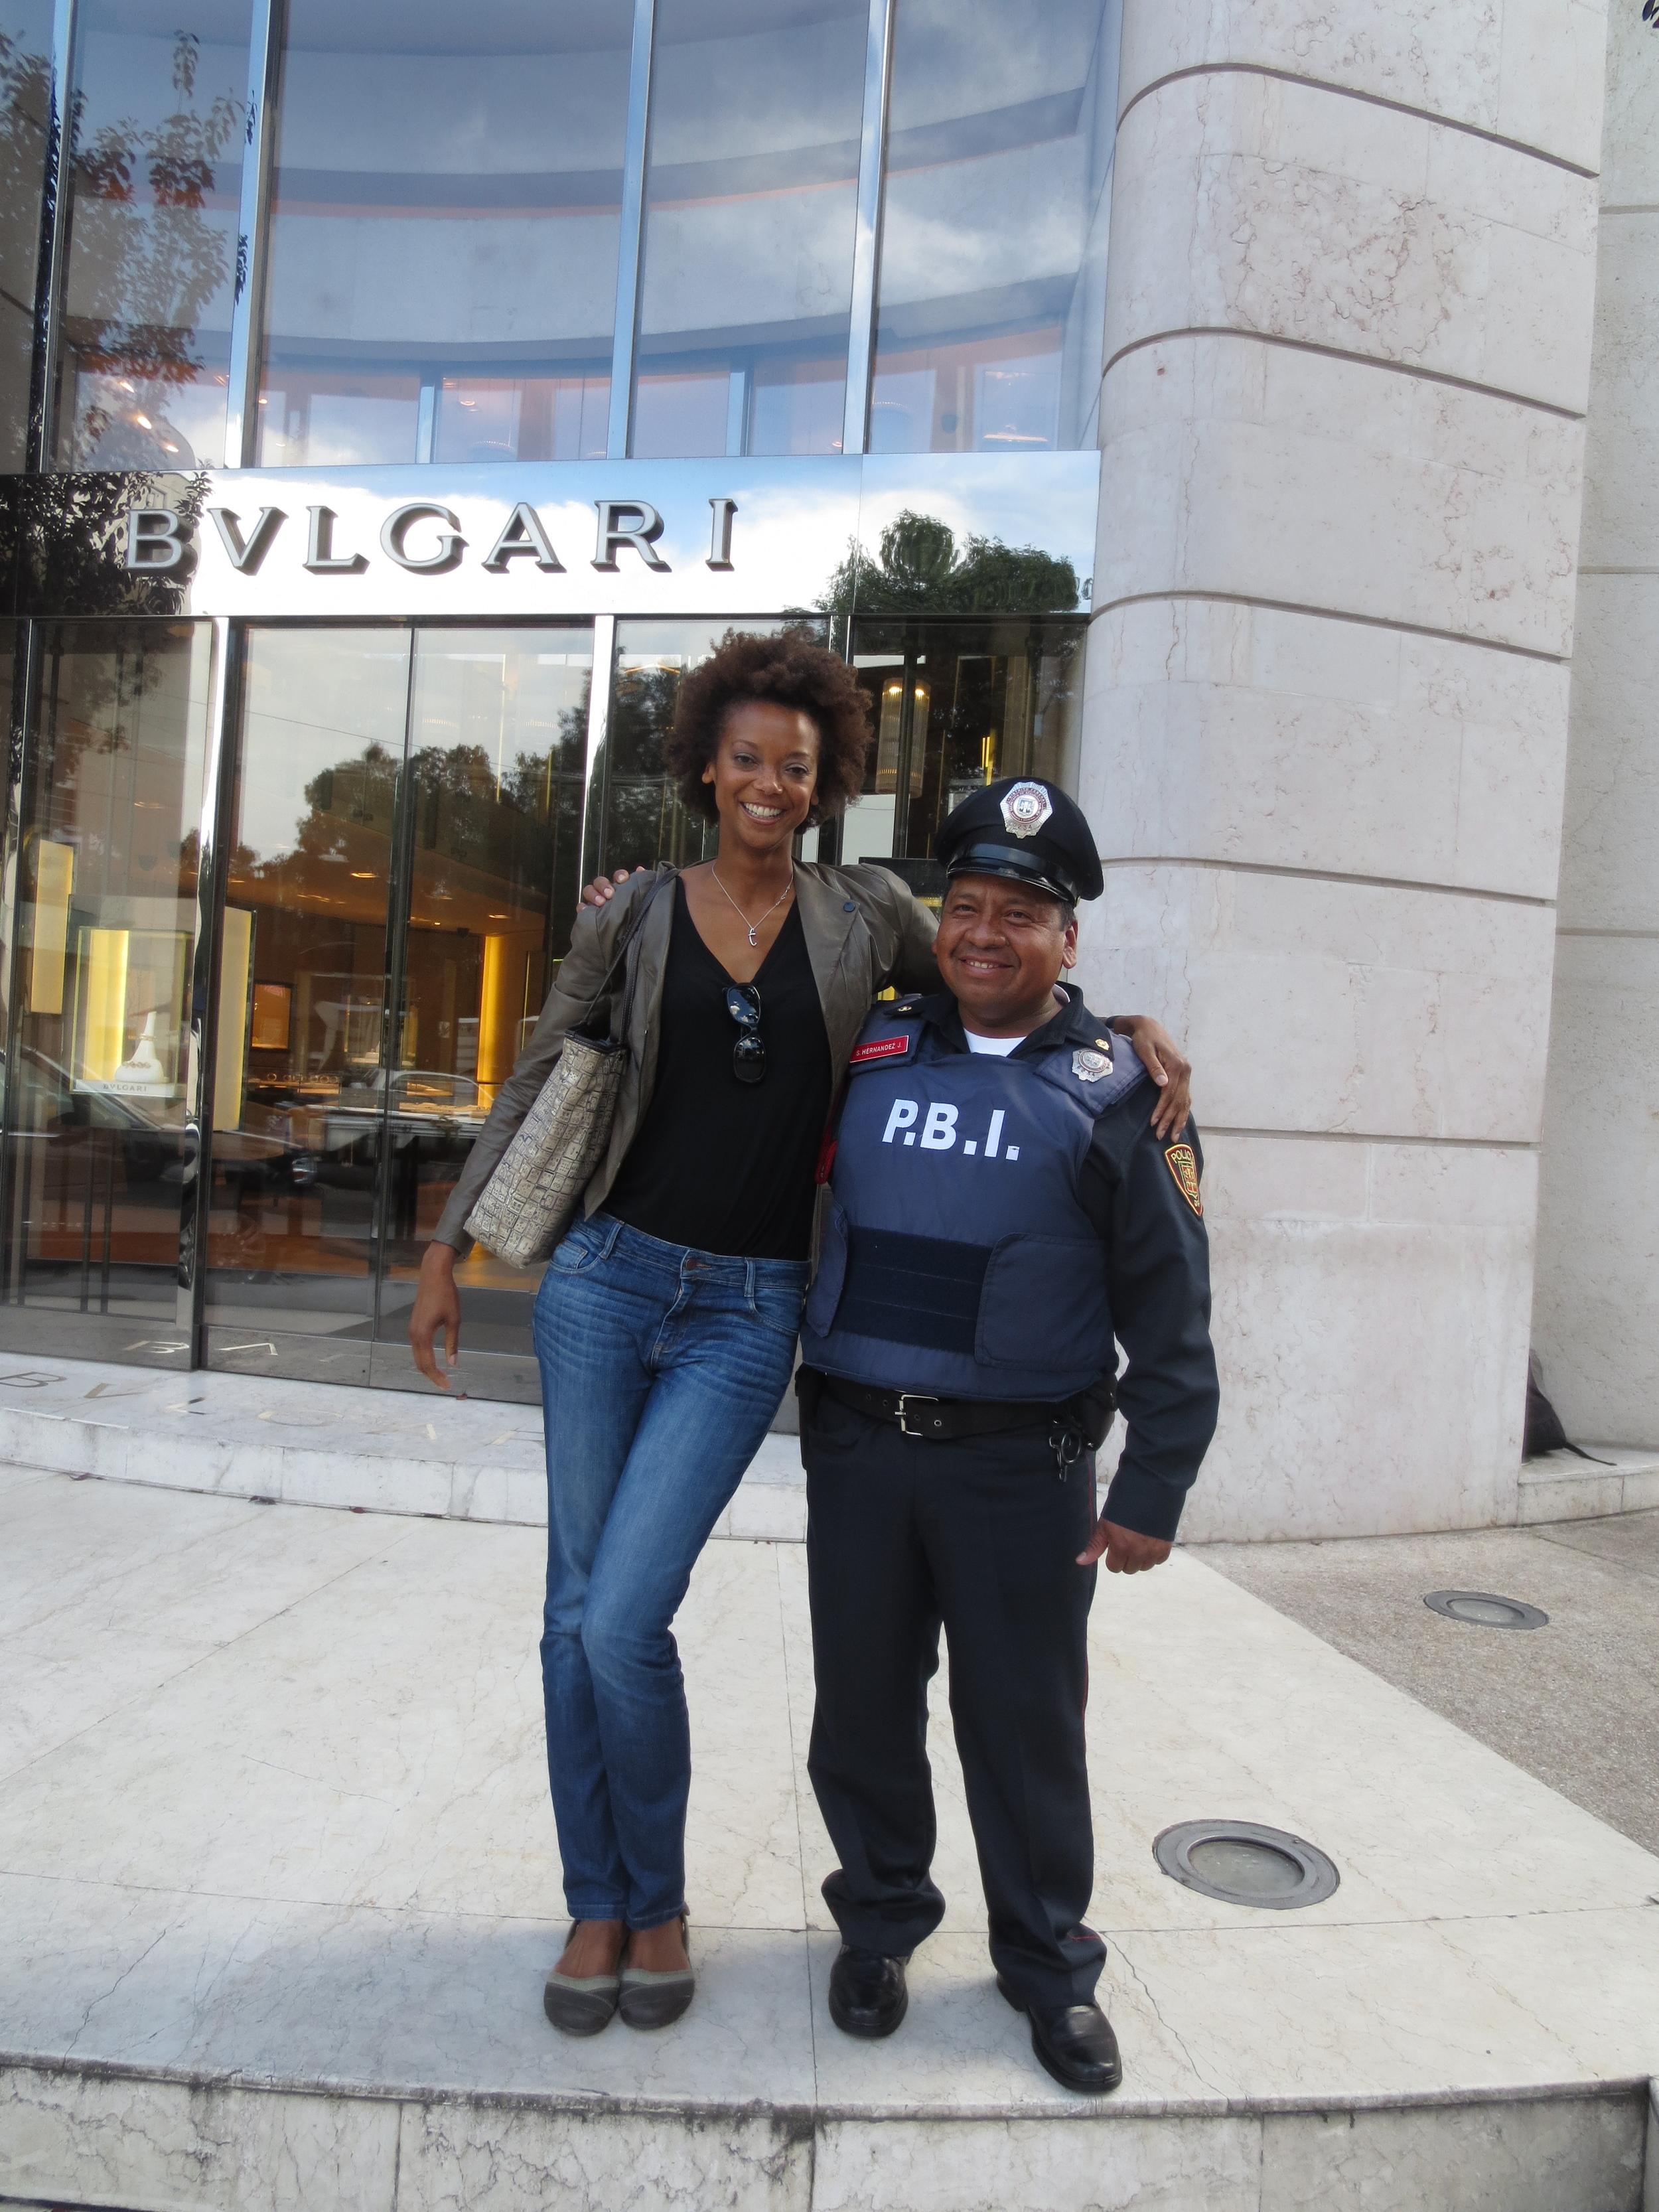 With a member of Mexico's PBI, Peace Brigade International.